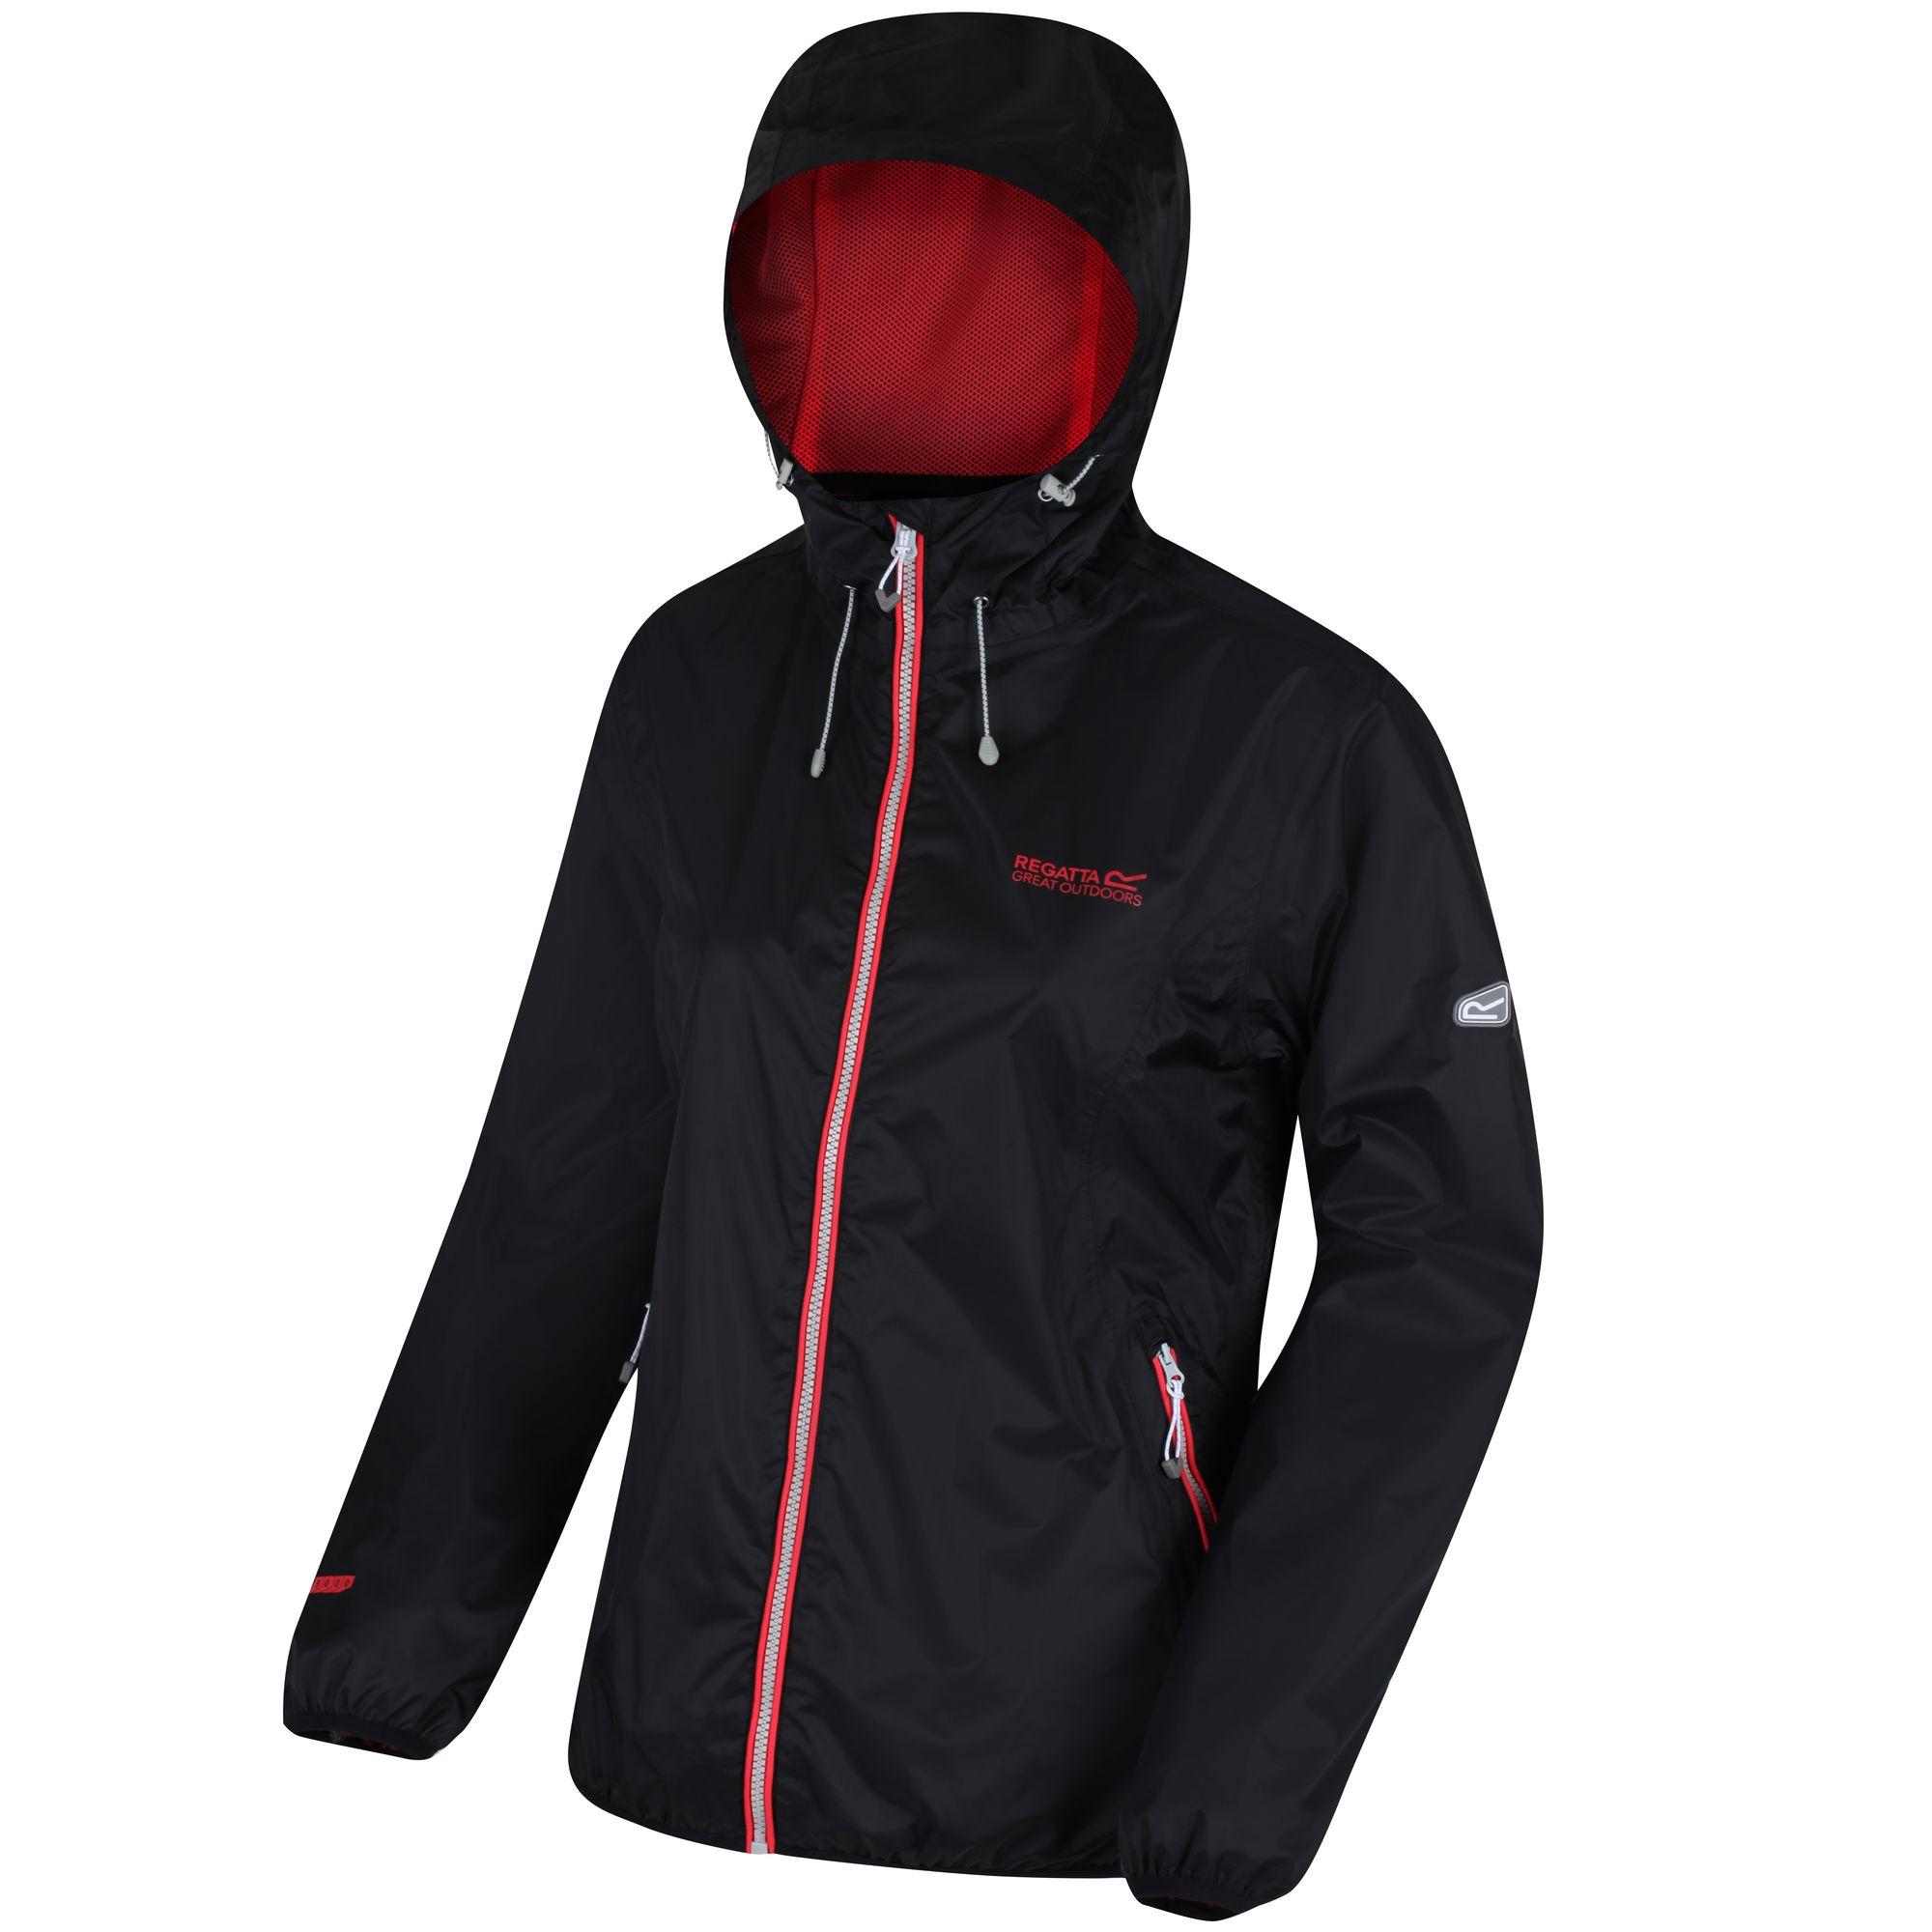 salt jackets evo s jacket quiksilver barns womens washed barn women